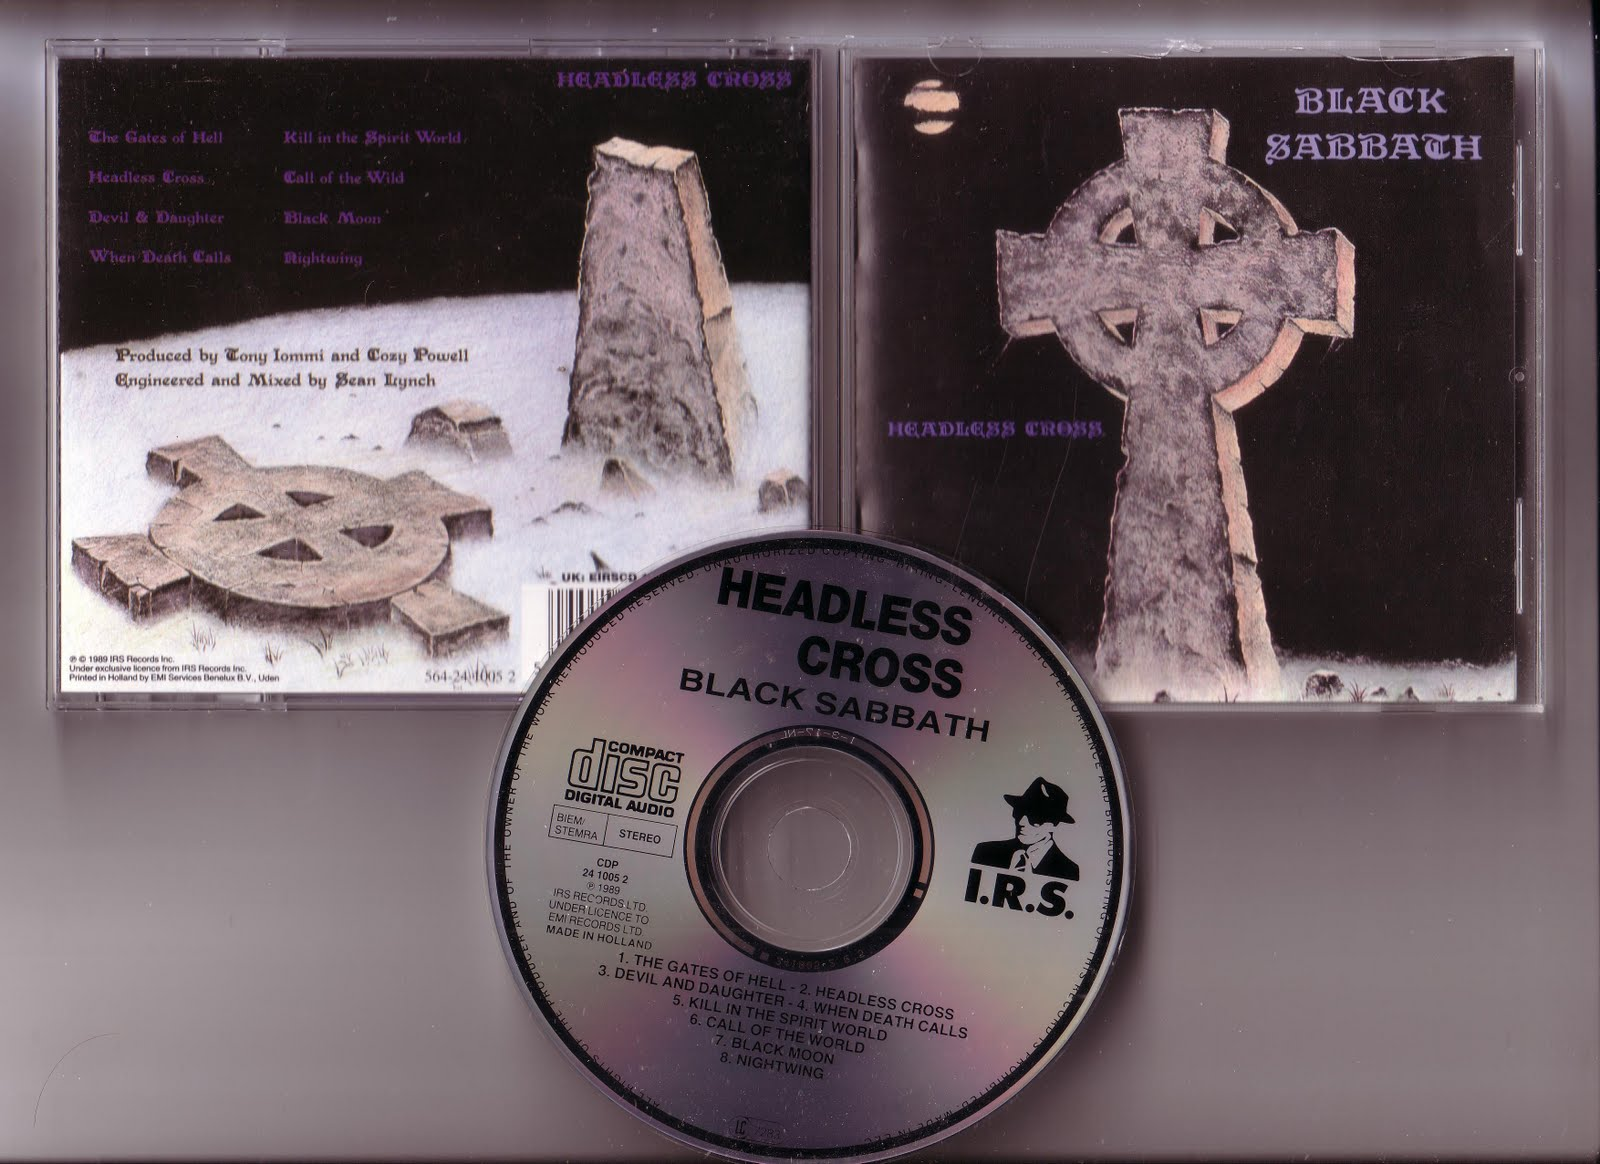 Source of Steel: Black Sabbath - Headless Cross